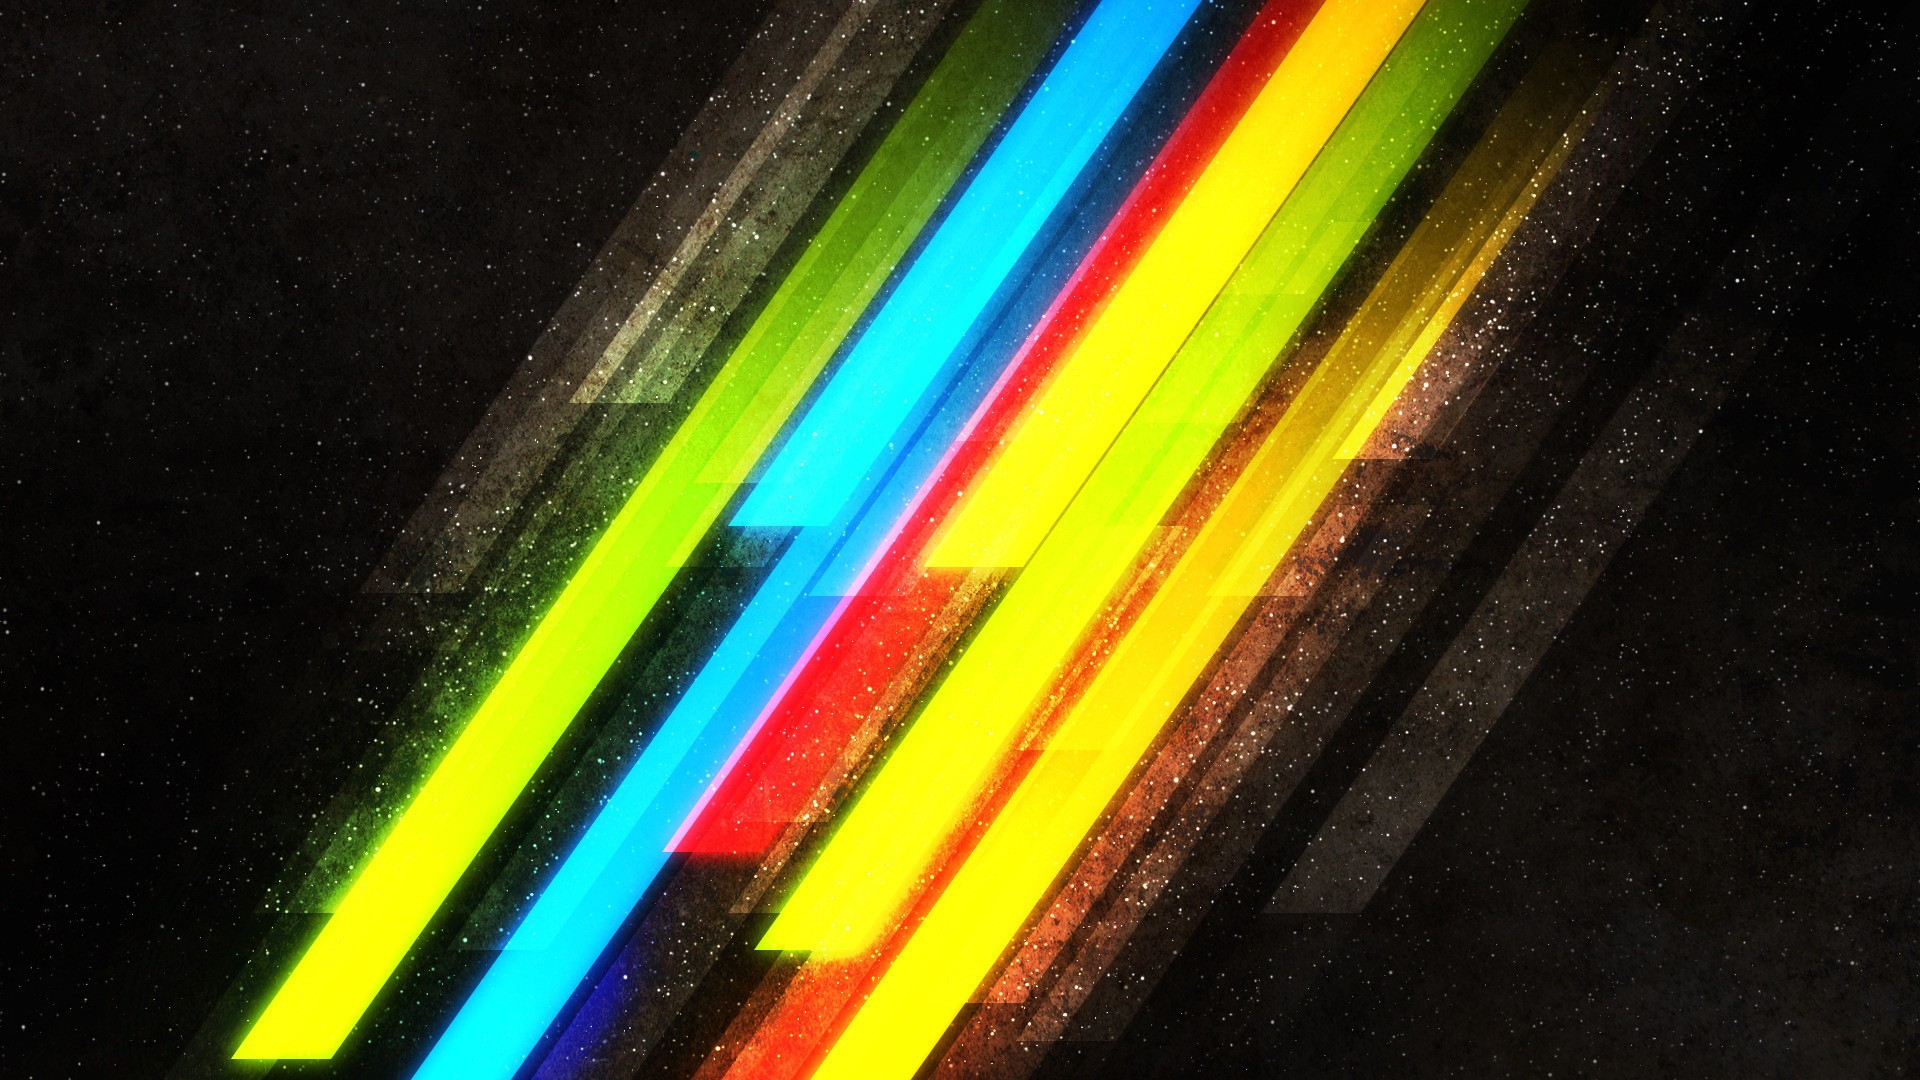 alot of colors